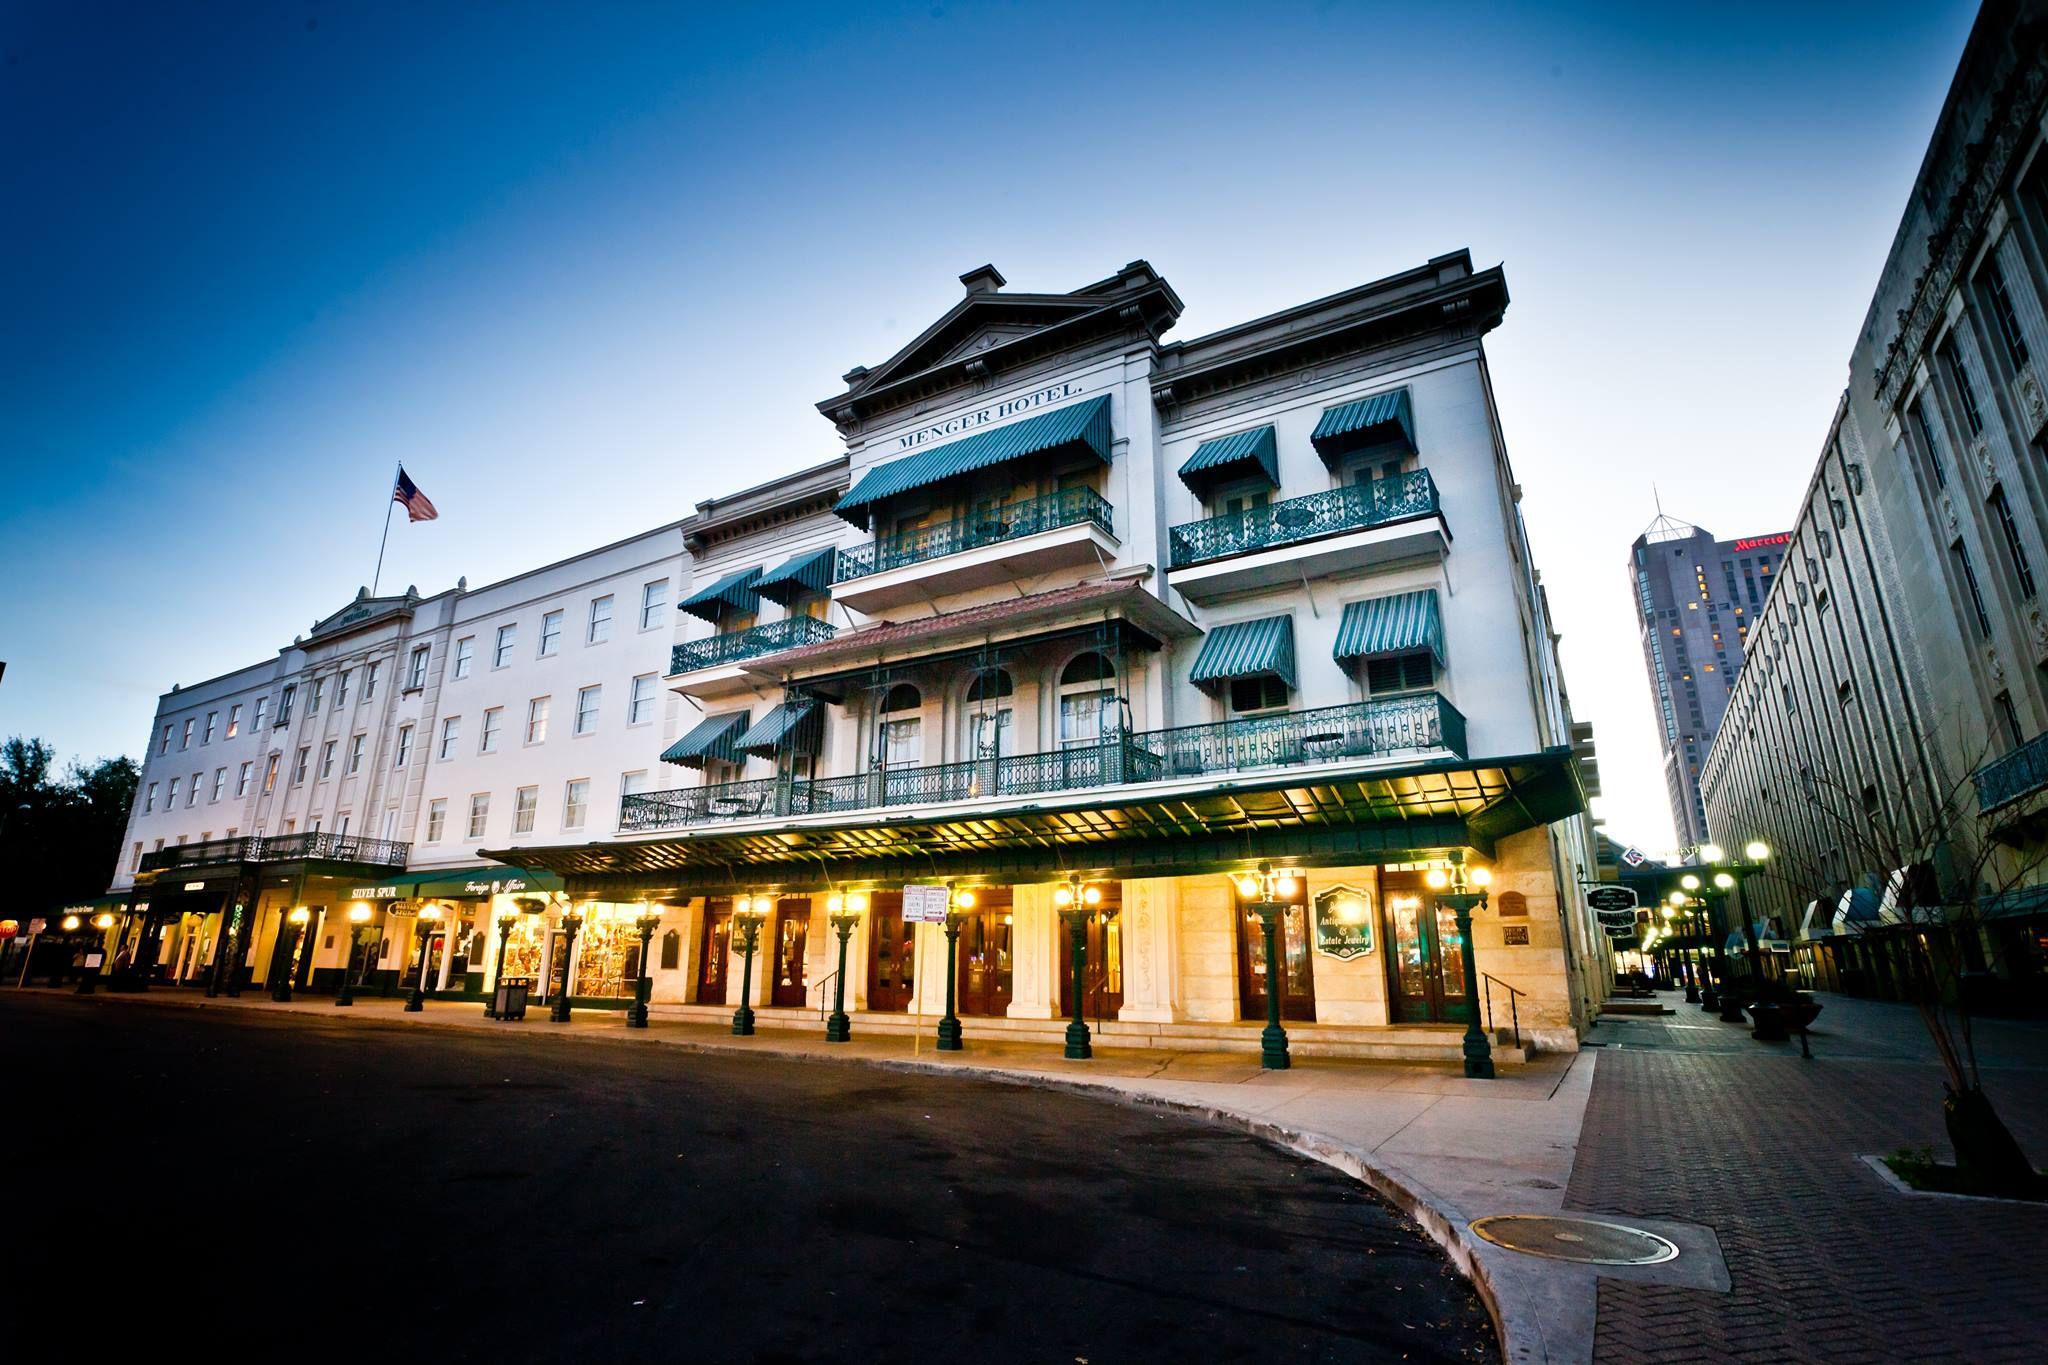 Hotel emily hotel r - Hotel Emily Hotel R 34